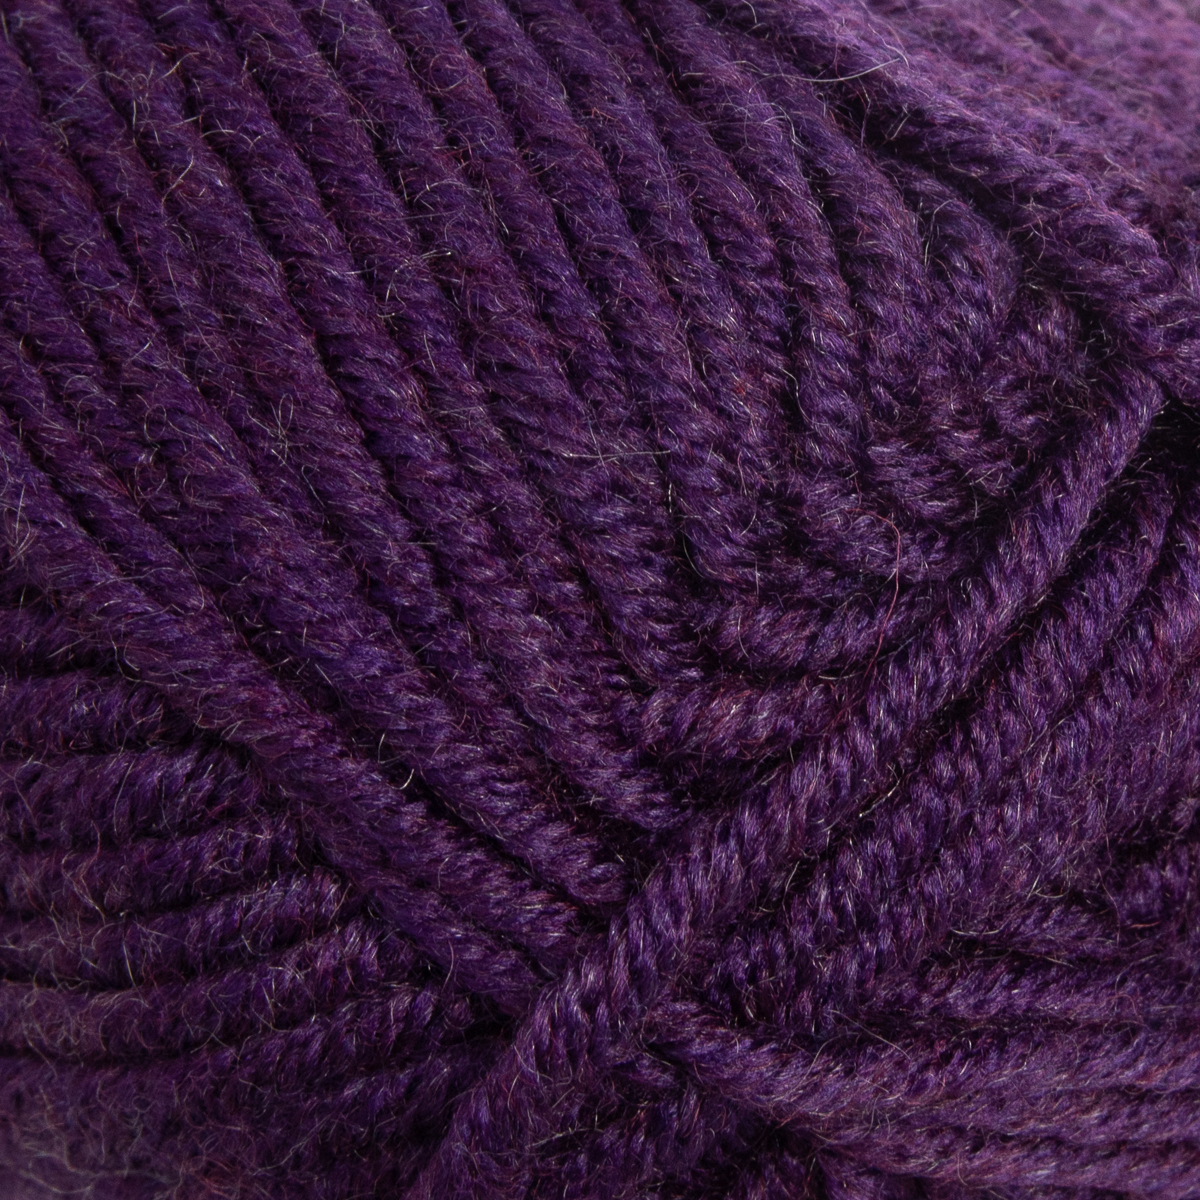 3pk-Lion-Brand-Woolspun-Acrylic-amp-Wool-Yarn-Bulky-5-Knit-Crocheting-Skeins-Soft thumbnail 55